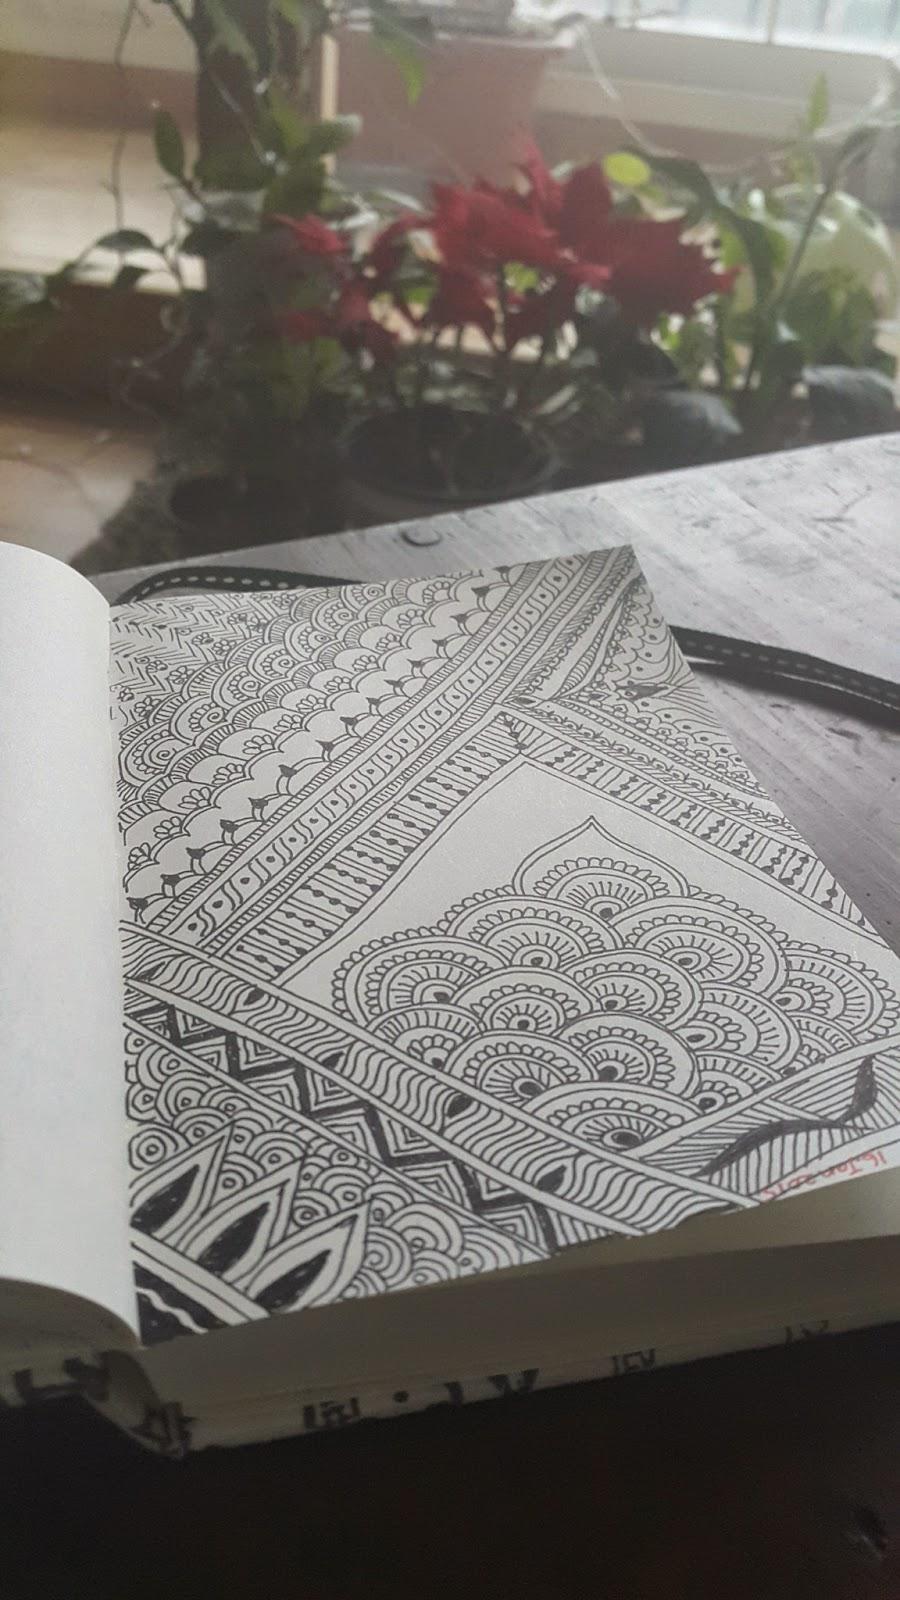 doodles in black